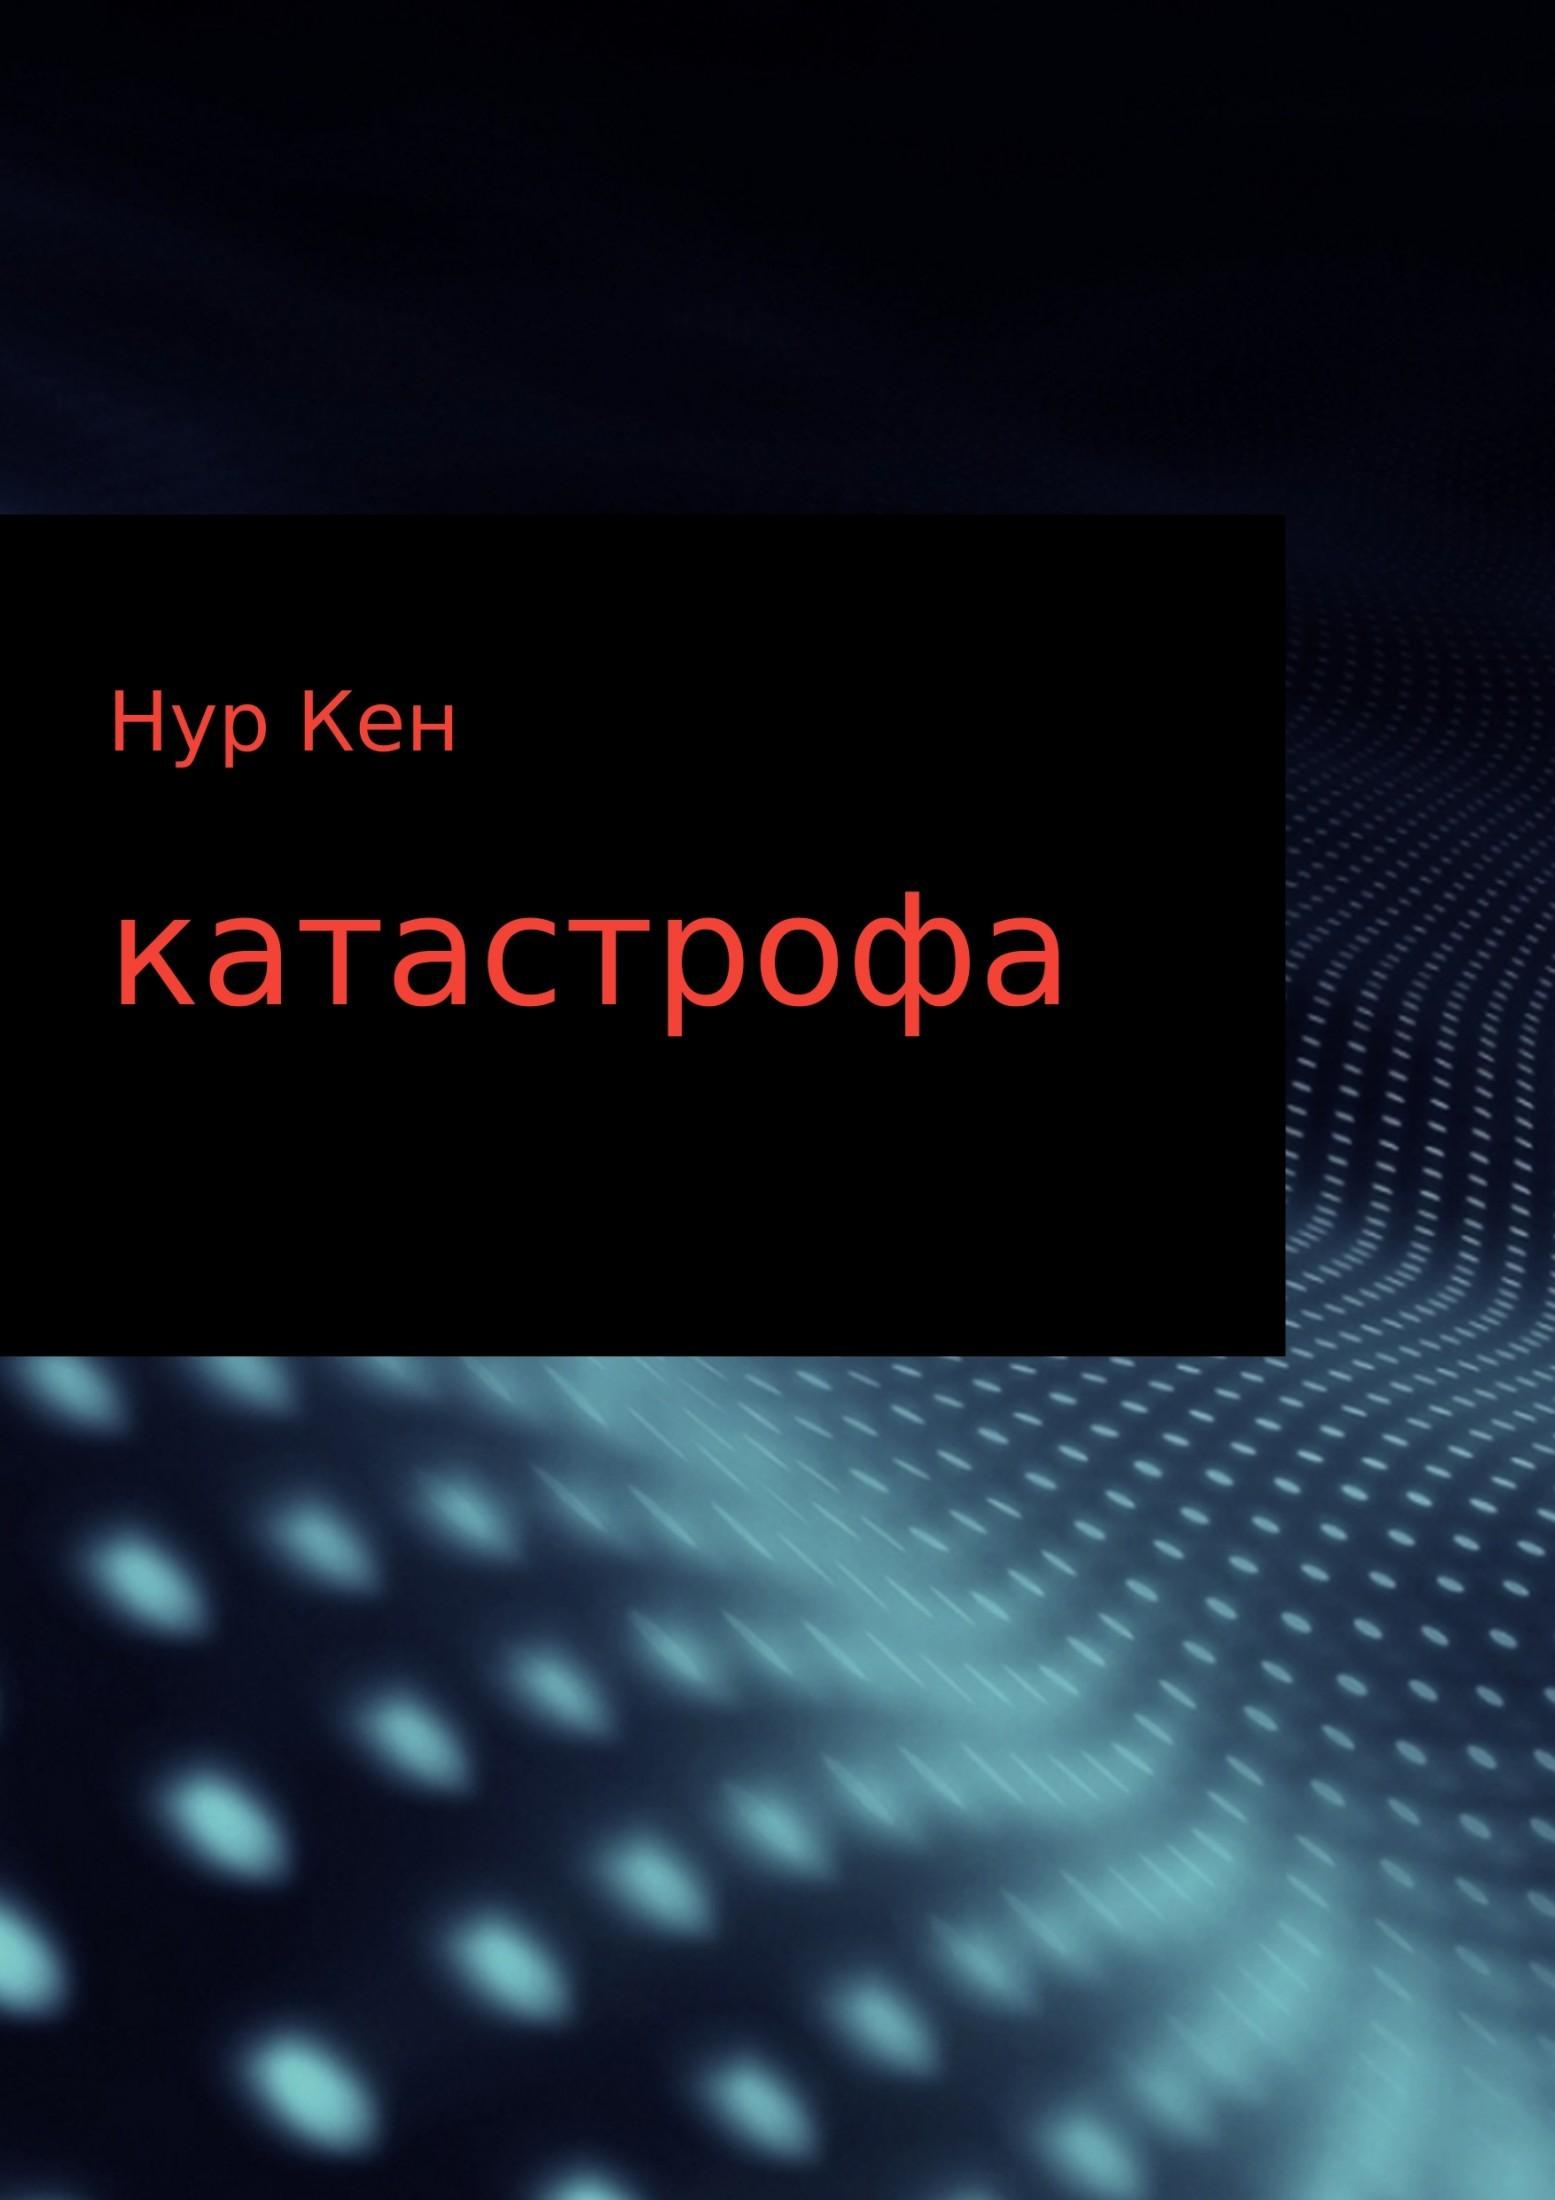 Нур Кен Катастрофа театр нур билеты уфа